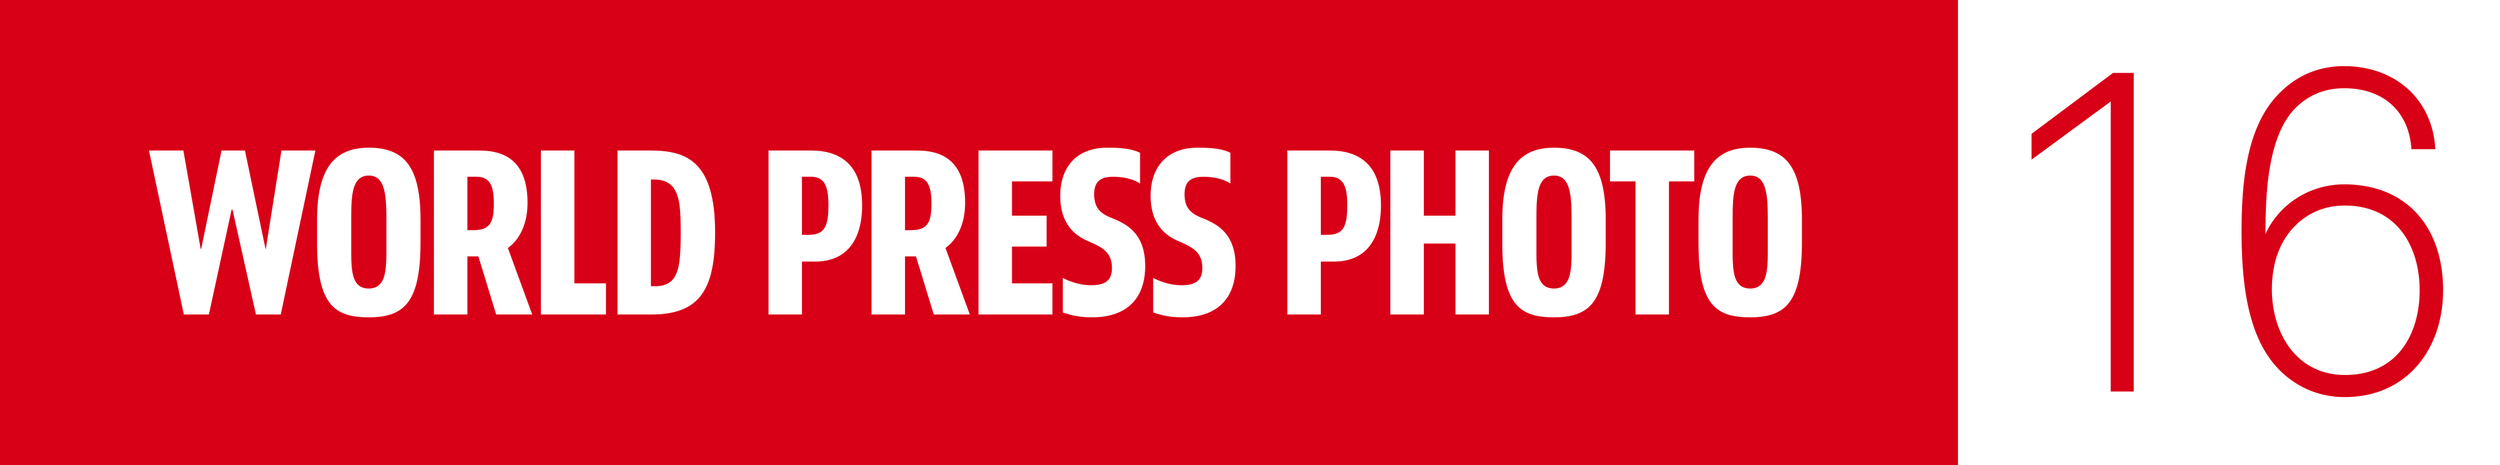 WPPH_logo16_fc_horizontal.jpg